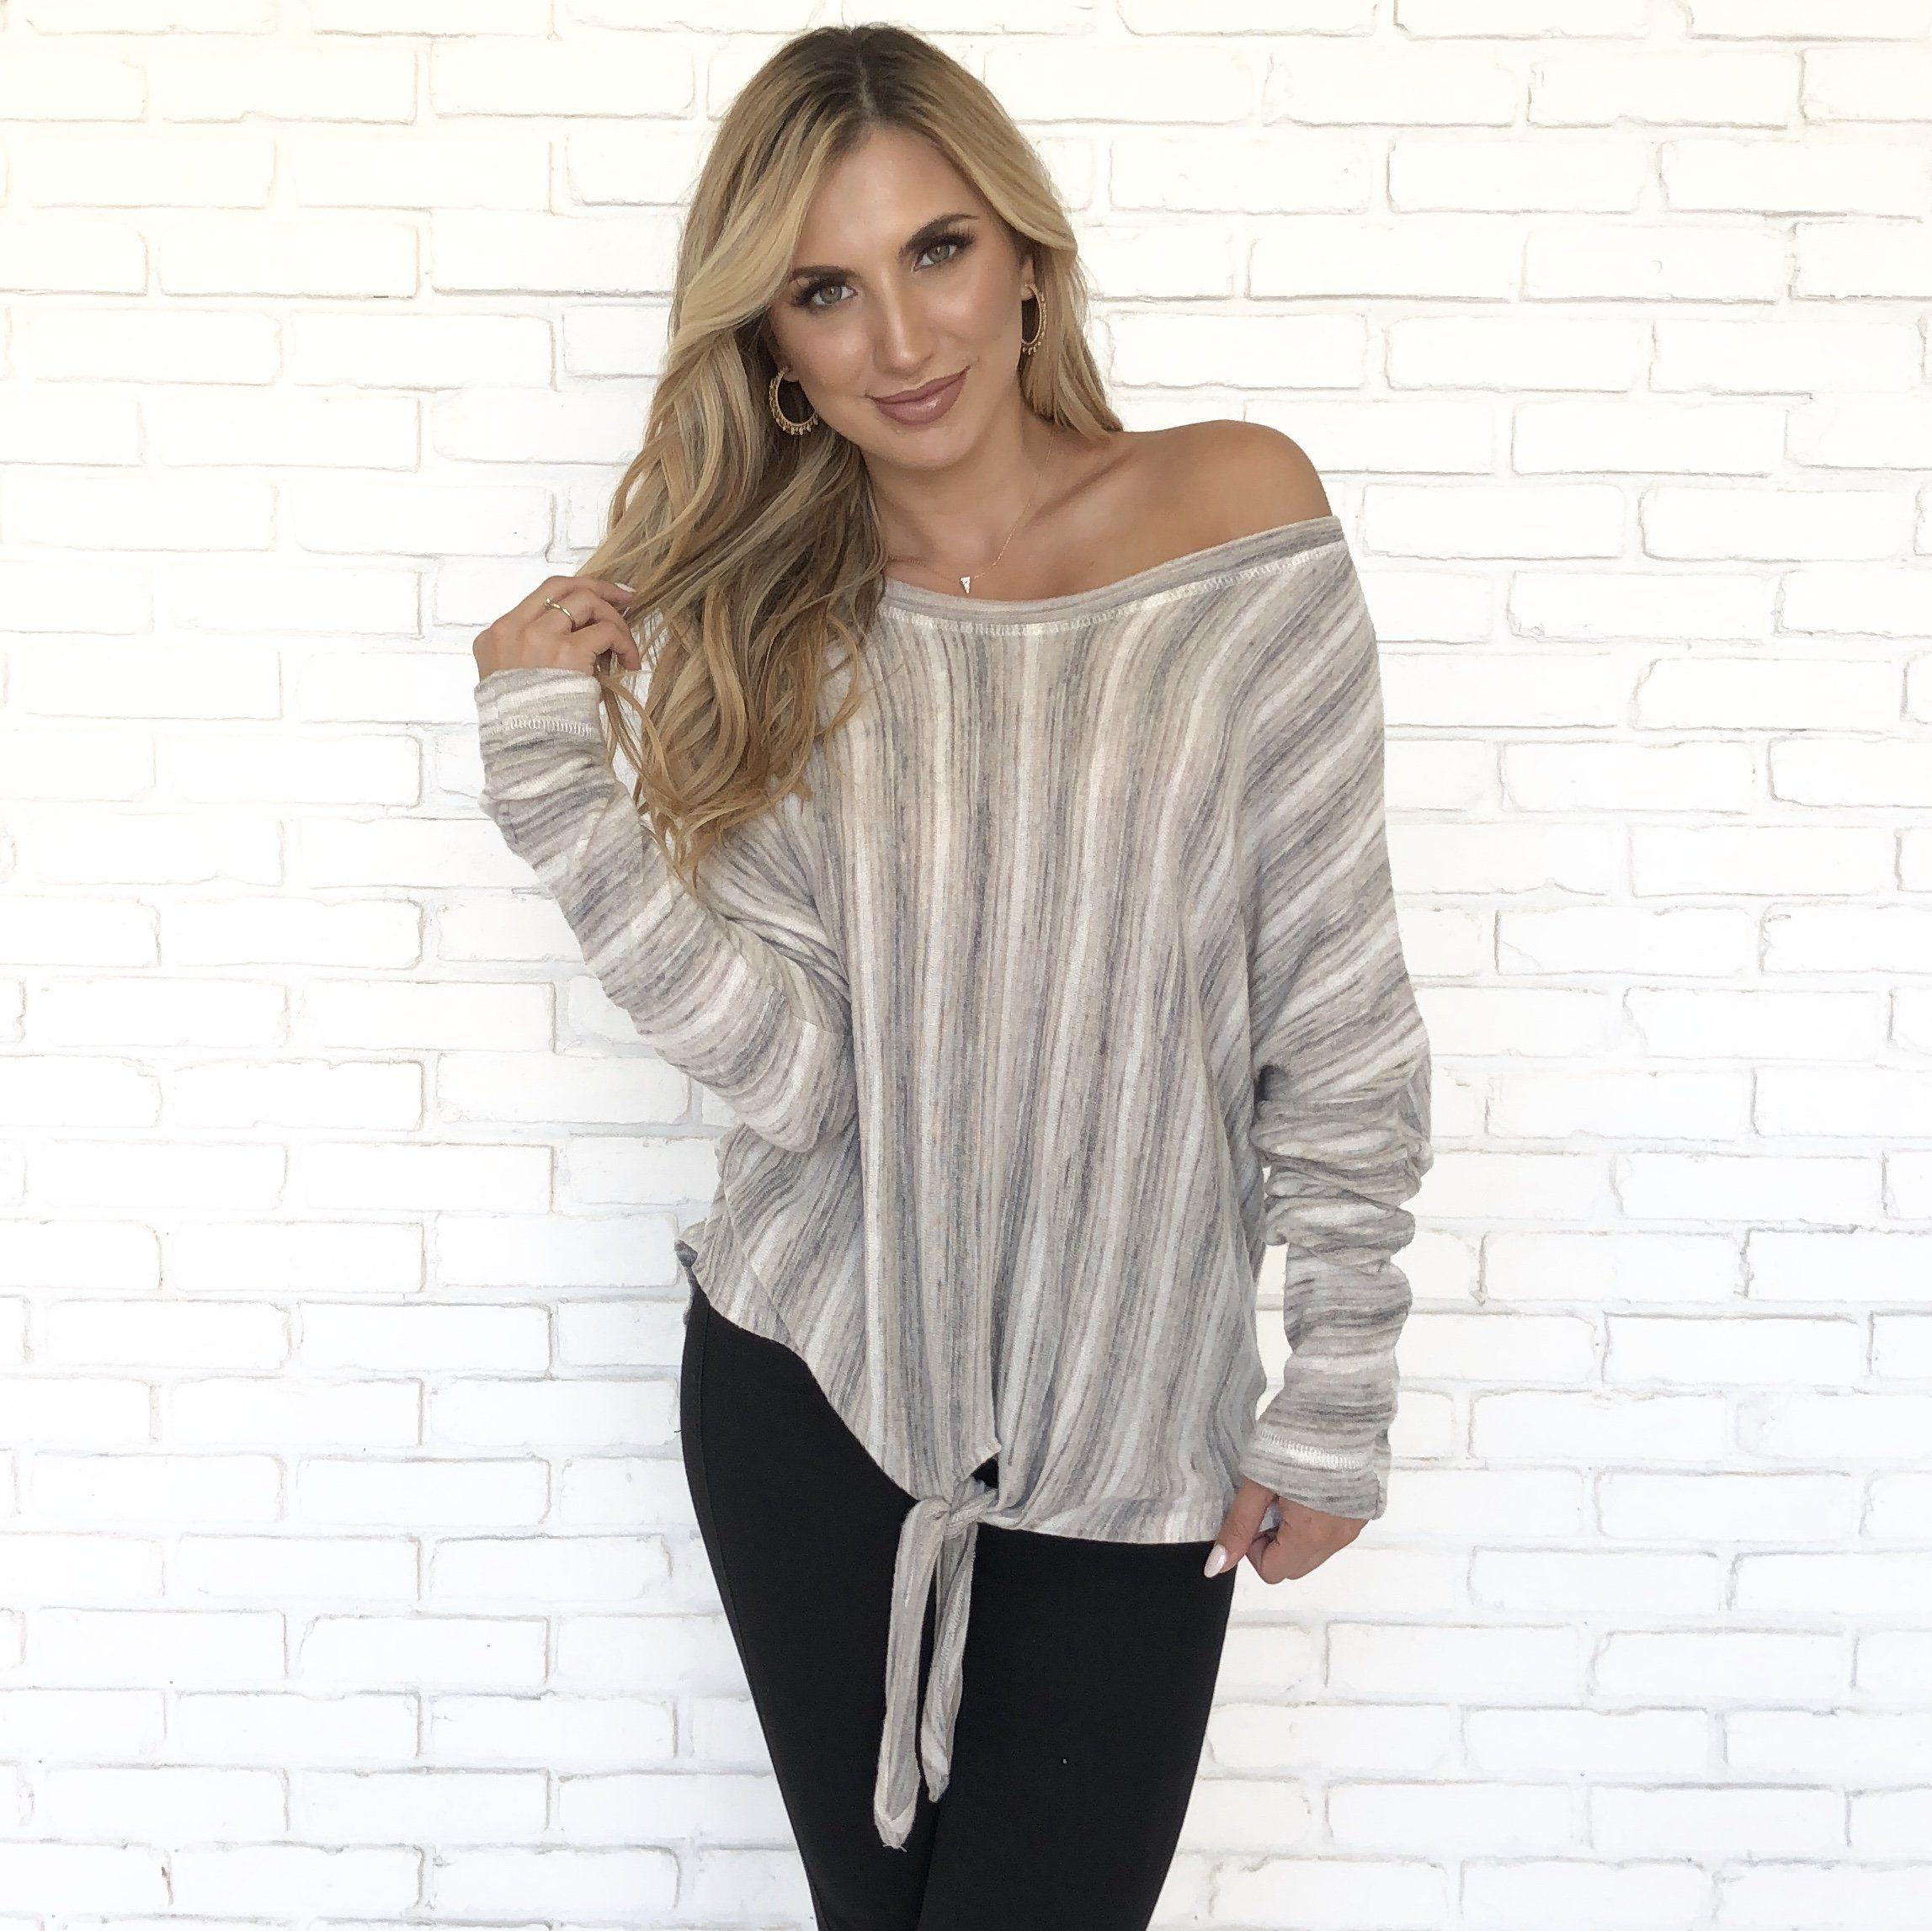 02c577e066babf Earth Tone Stripe Fleece Top - Dainty Hooligan Boutique | Sweater ...